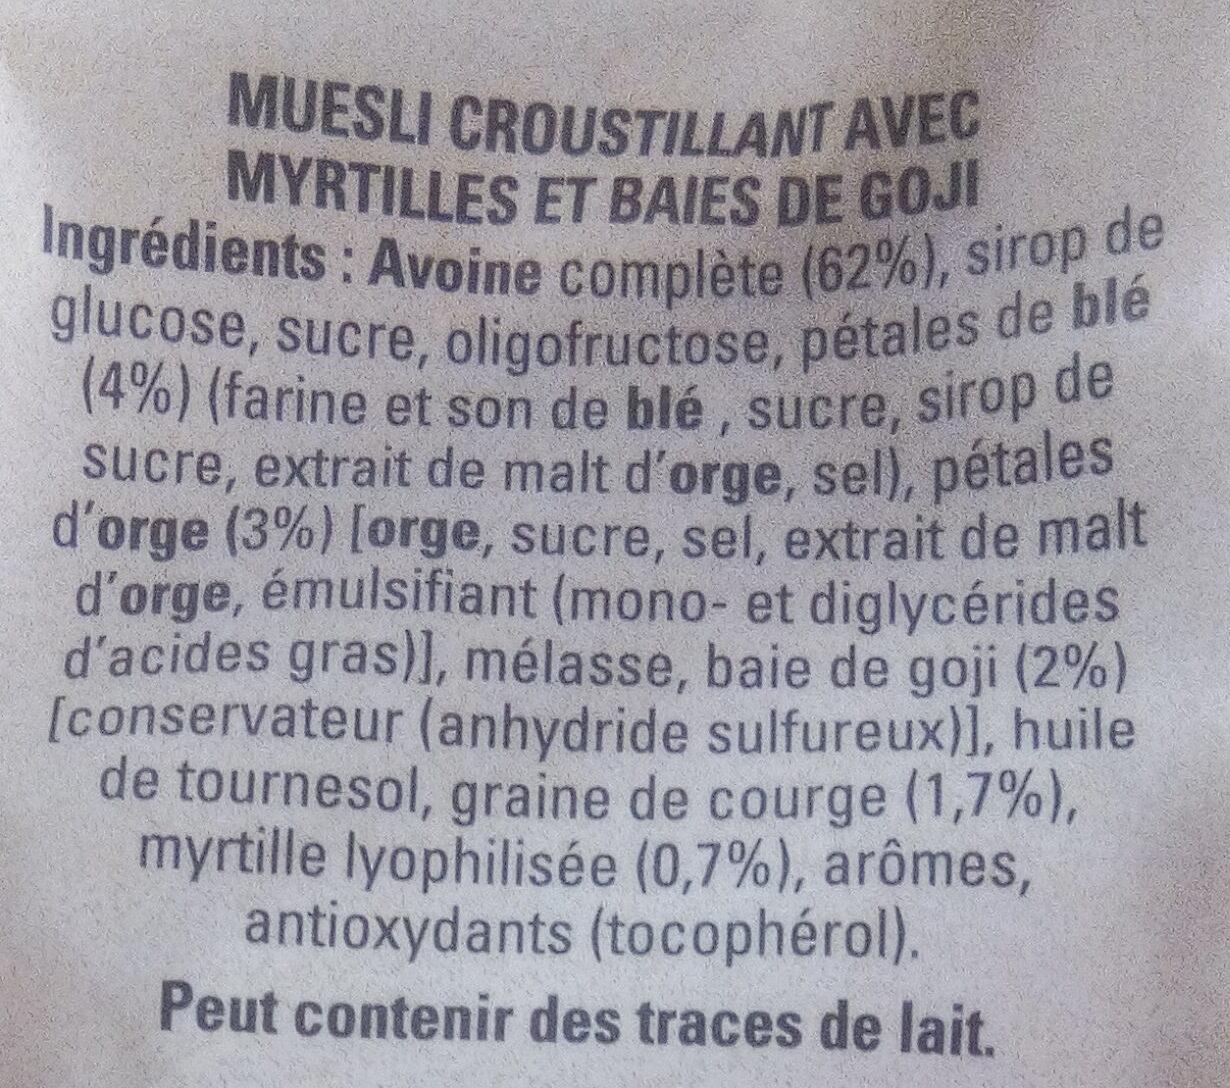 Muesli Croustillant Myrtilles & Baies de Goji - Ingredients